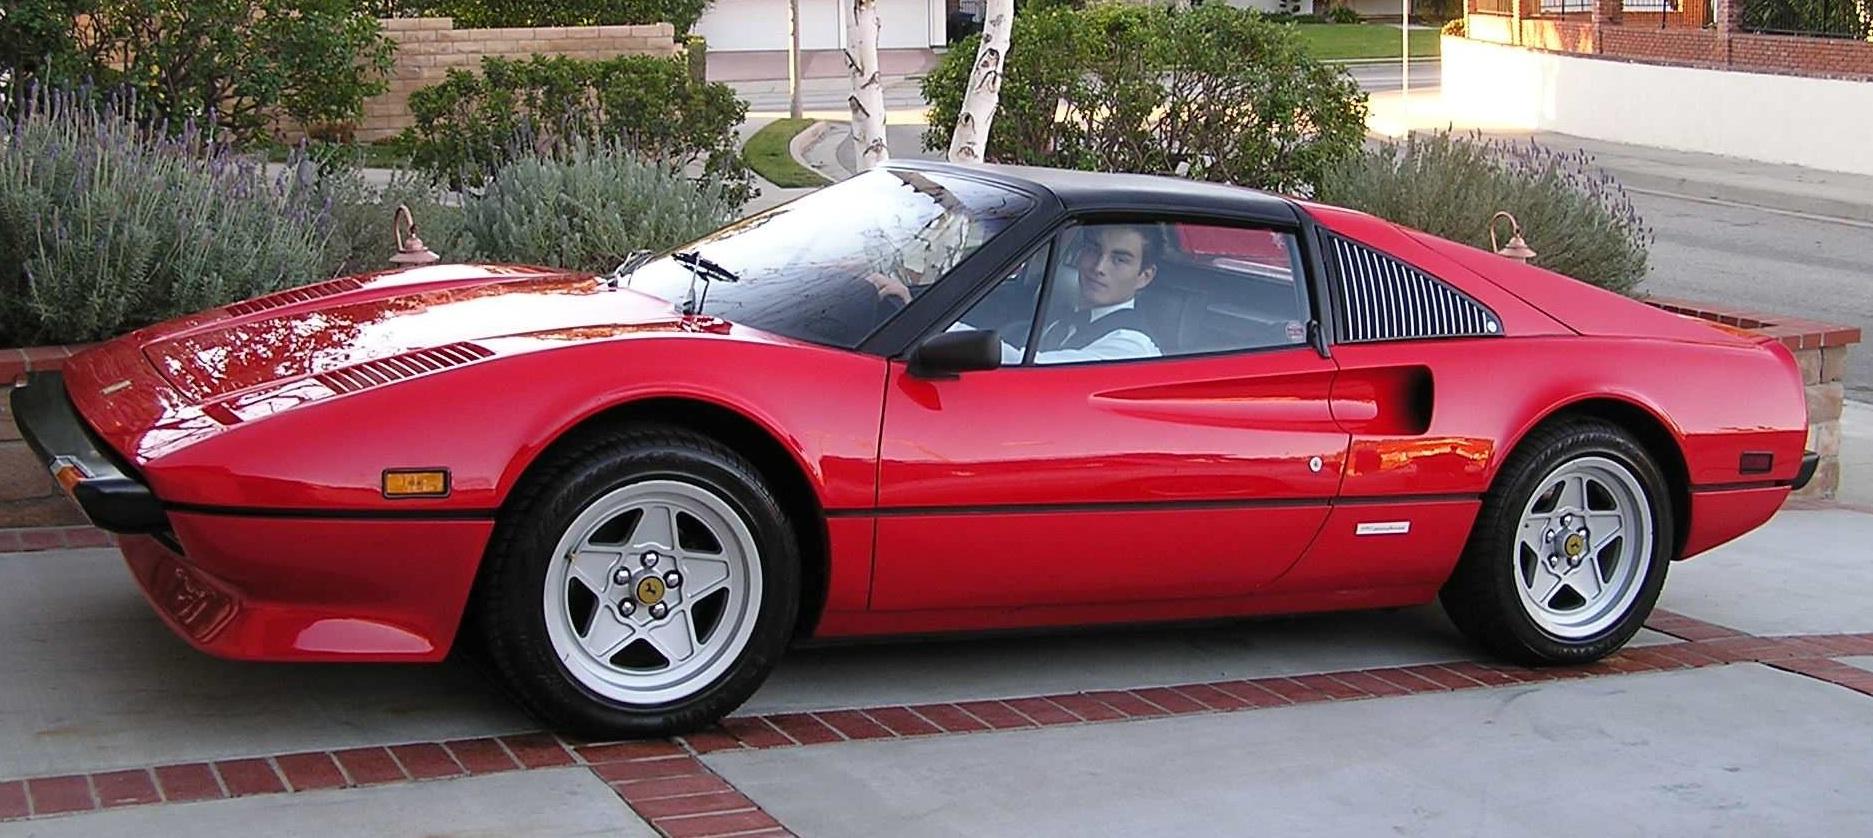 ferrari 308 gts picture 14 reviews news specs buy car. Black Bedroom Furniture Sets. Home Design Ideas